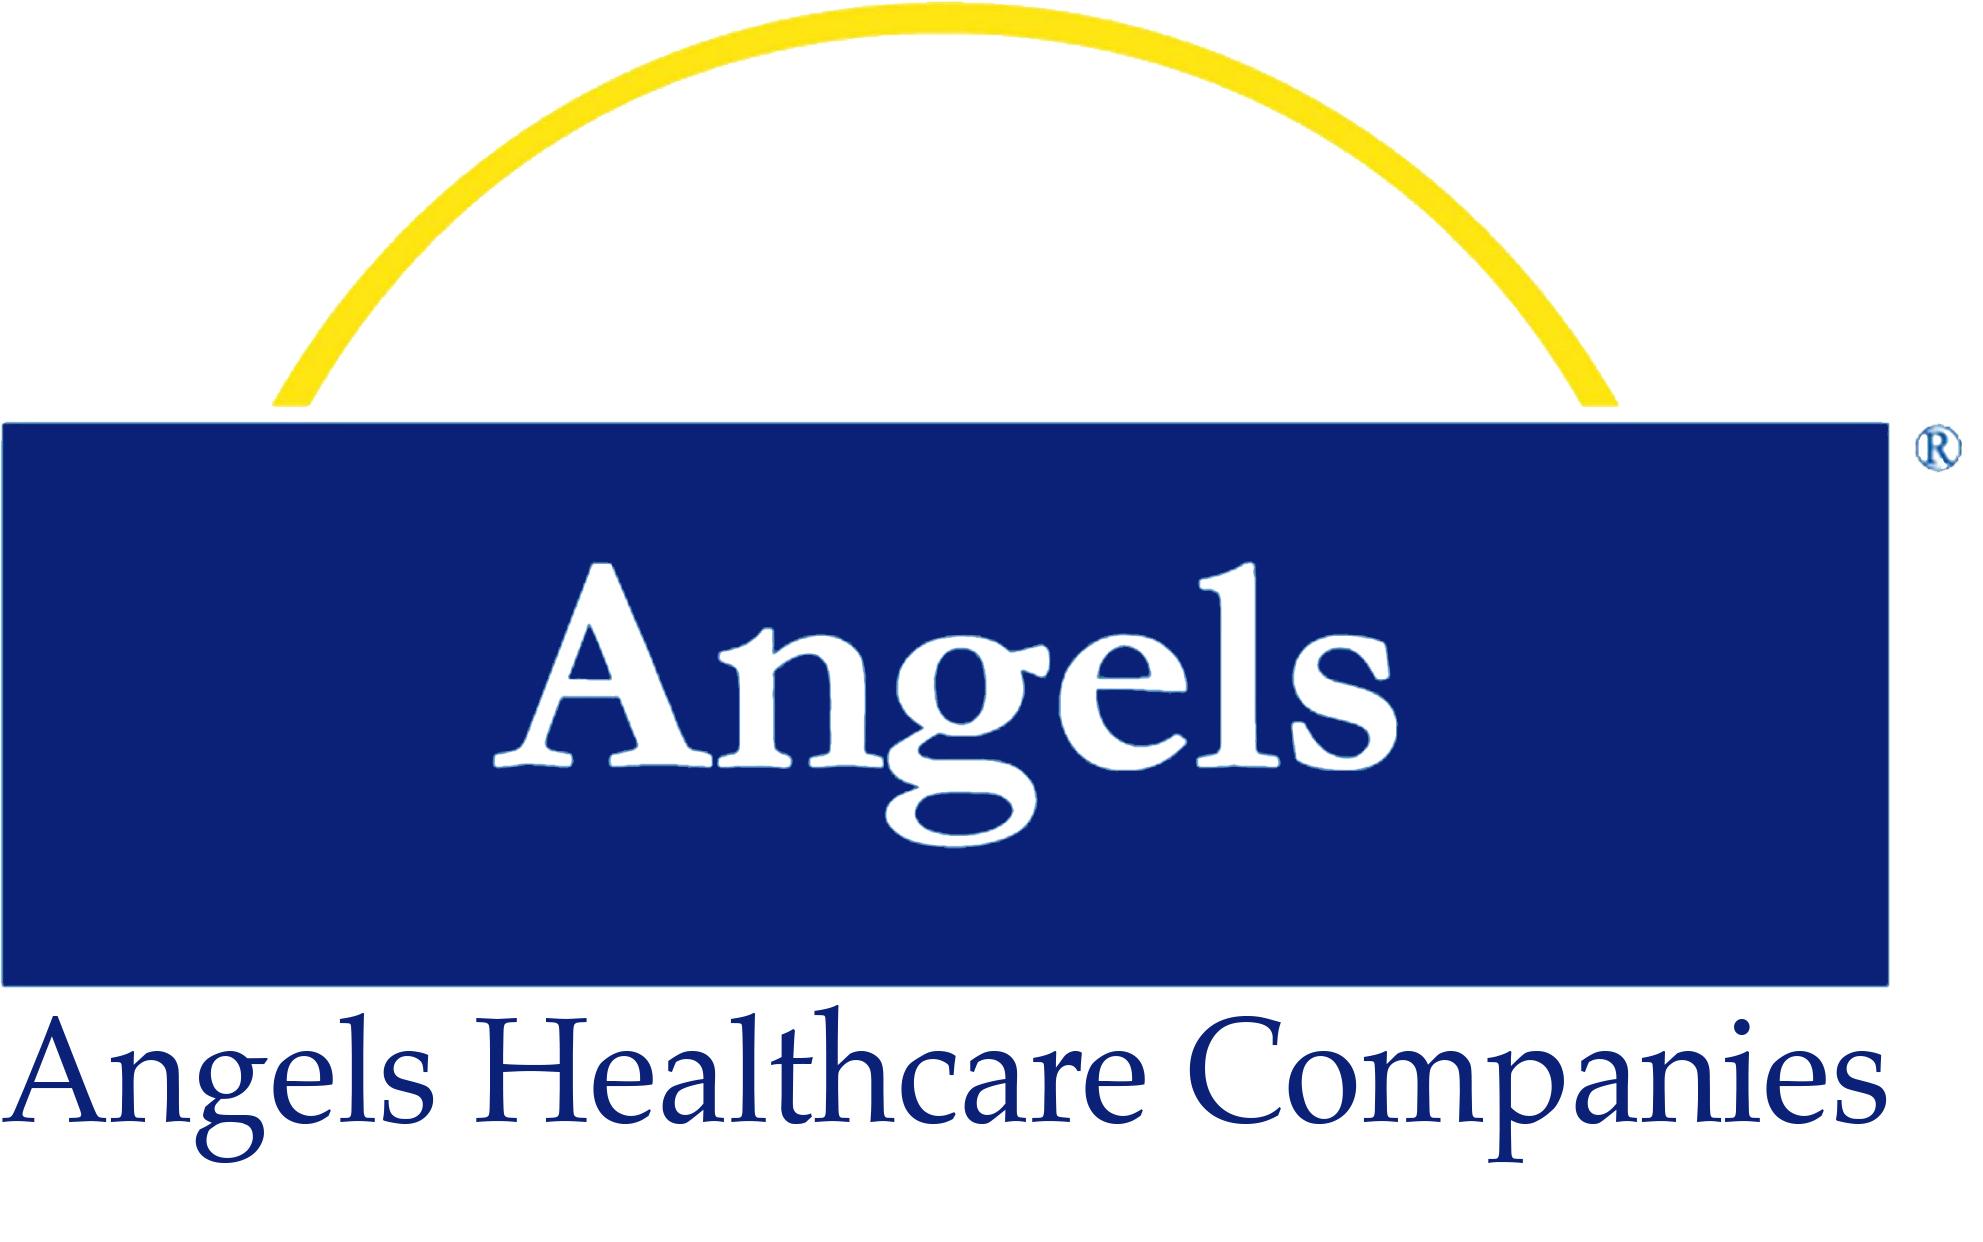 Angels Healthcare Companies Logo